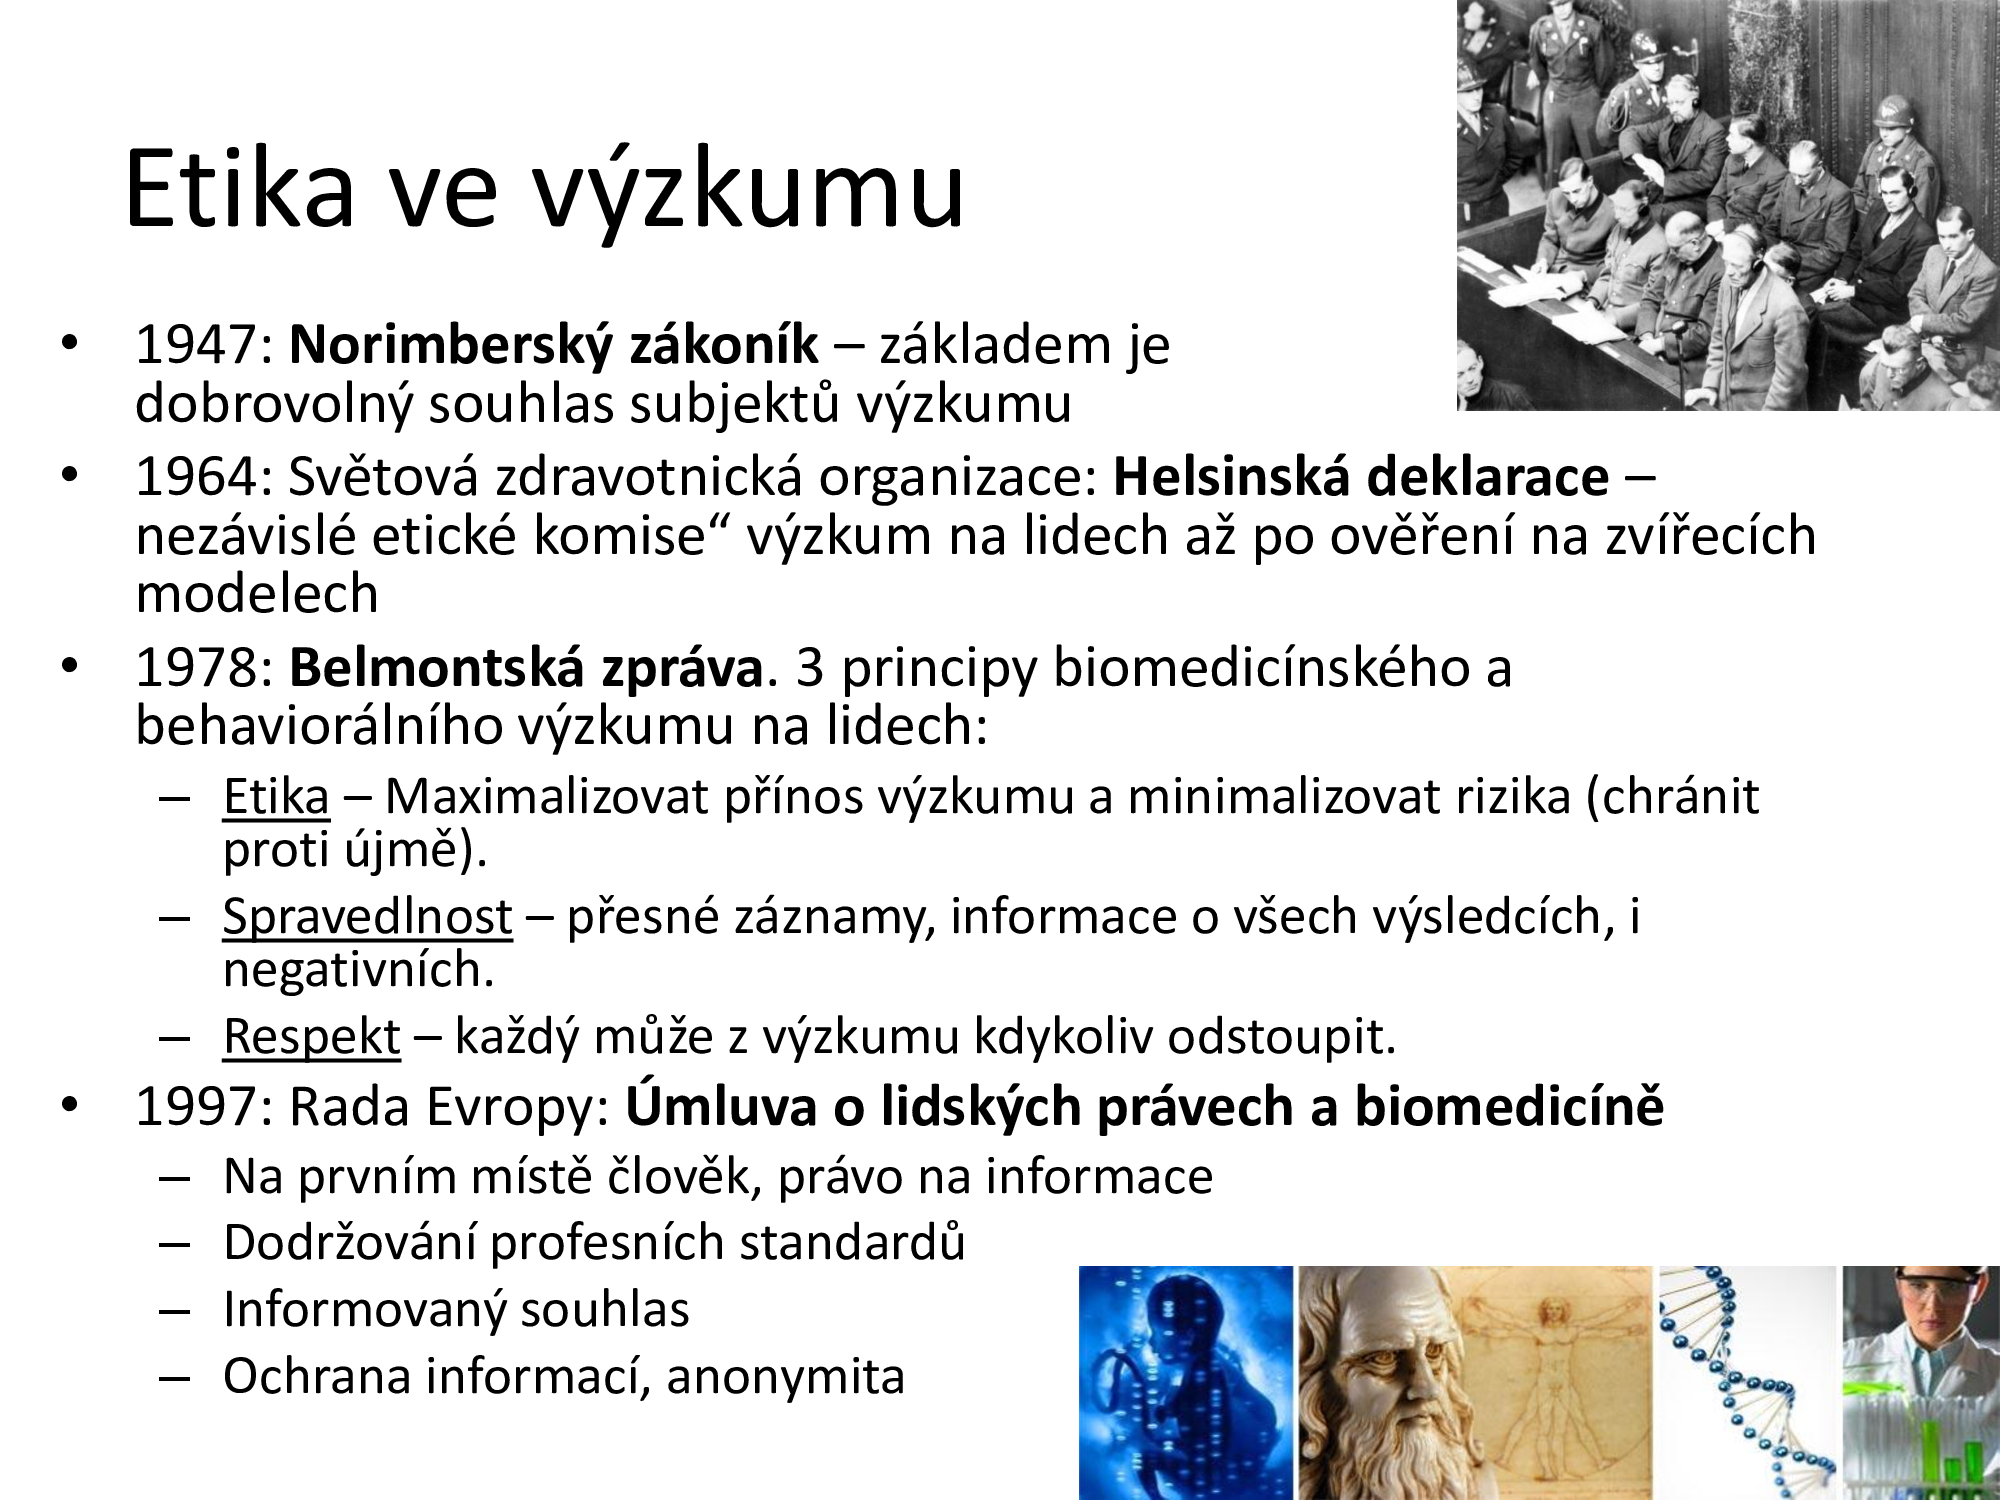 etika-ve-vyzkumu.jpg